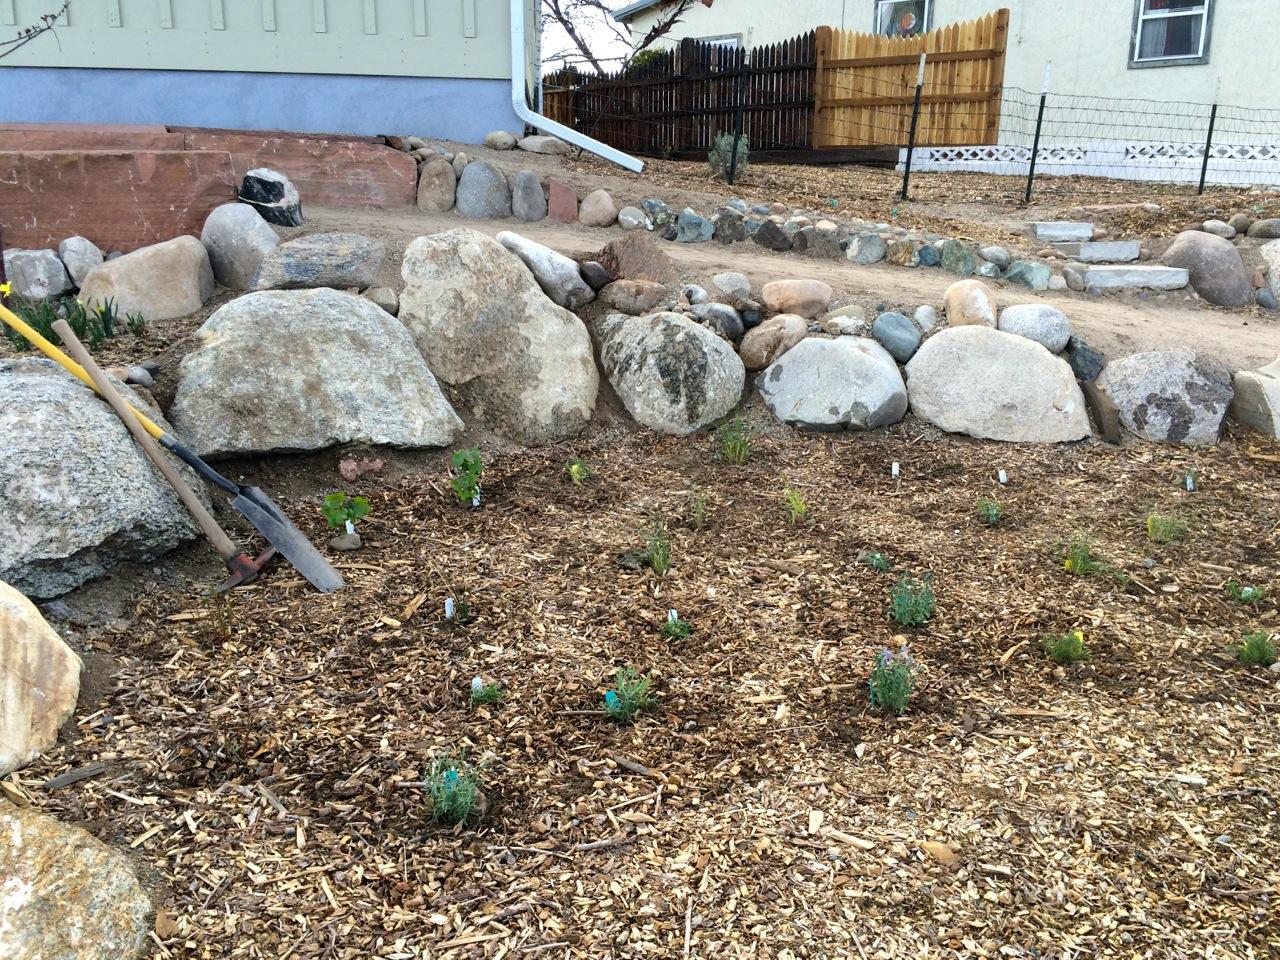 My mattox and spade relaxing after planting 33 perennials in a pollinator garden.